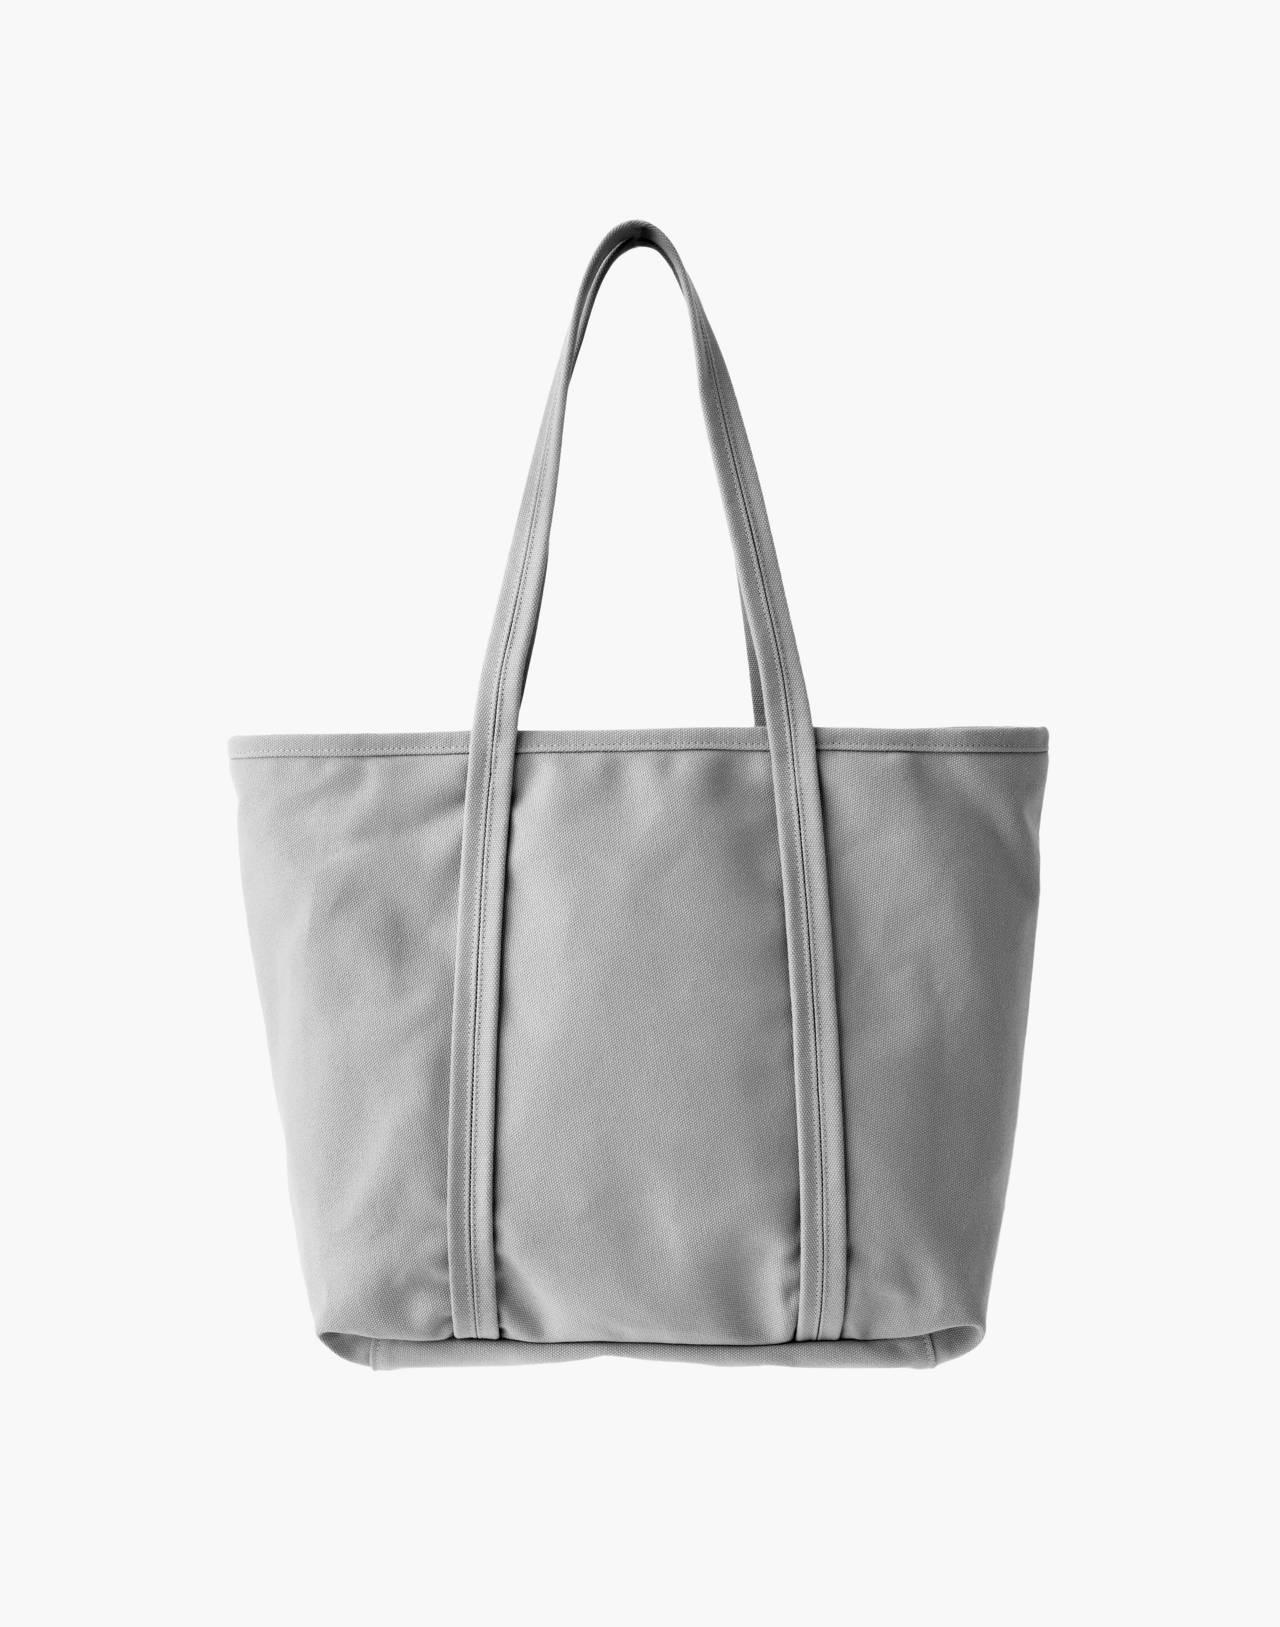 MAKR Canvas Day Tote Bag in grey image 2